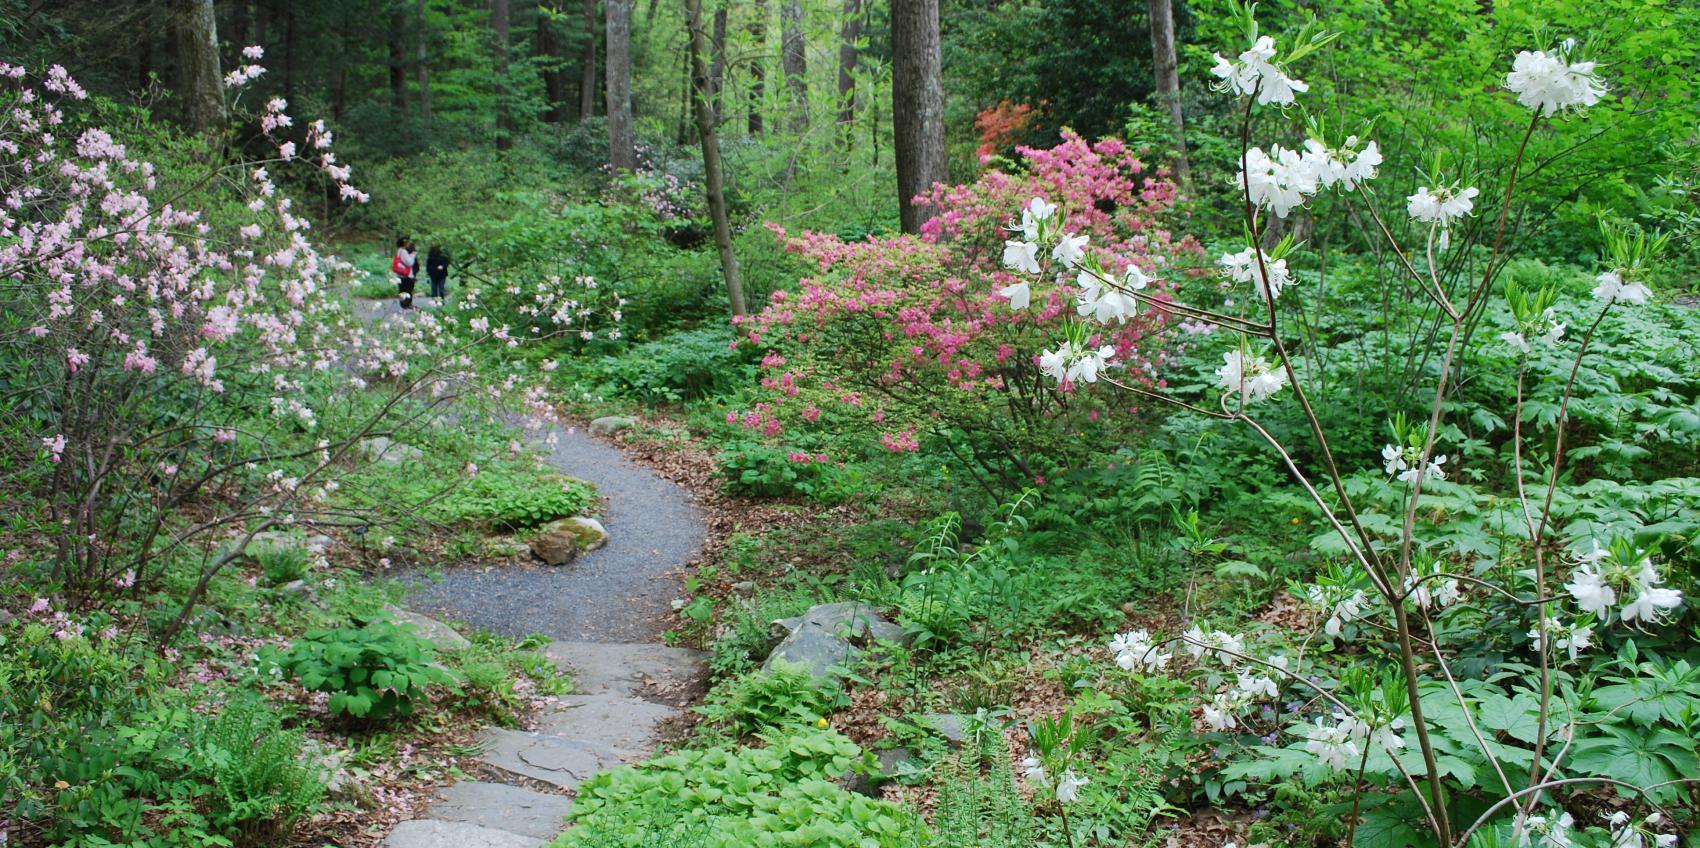 New england wild flower society american public gardens for Garden trees england